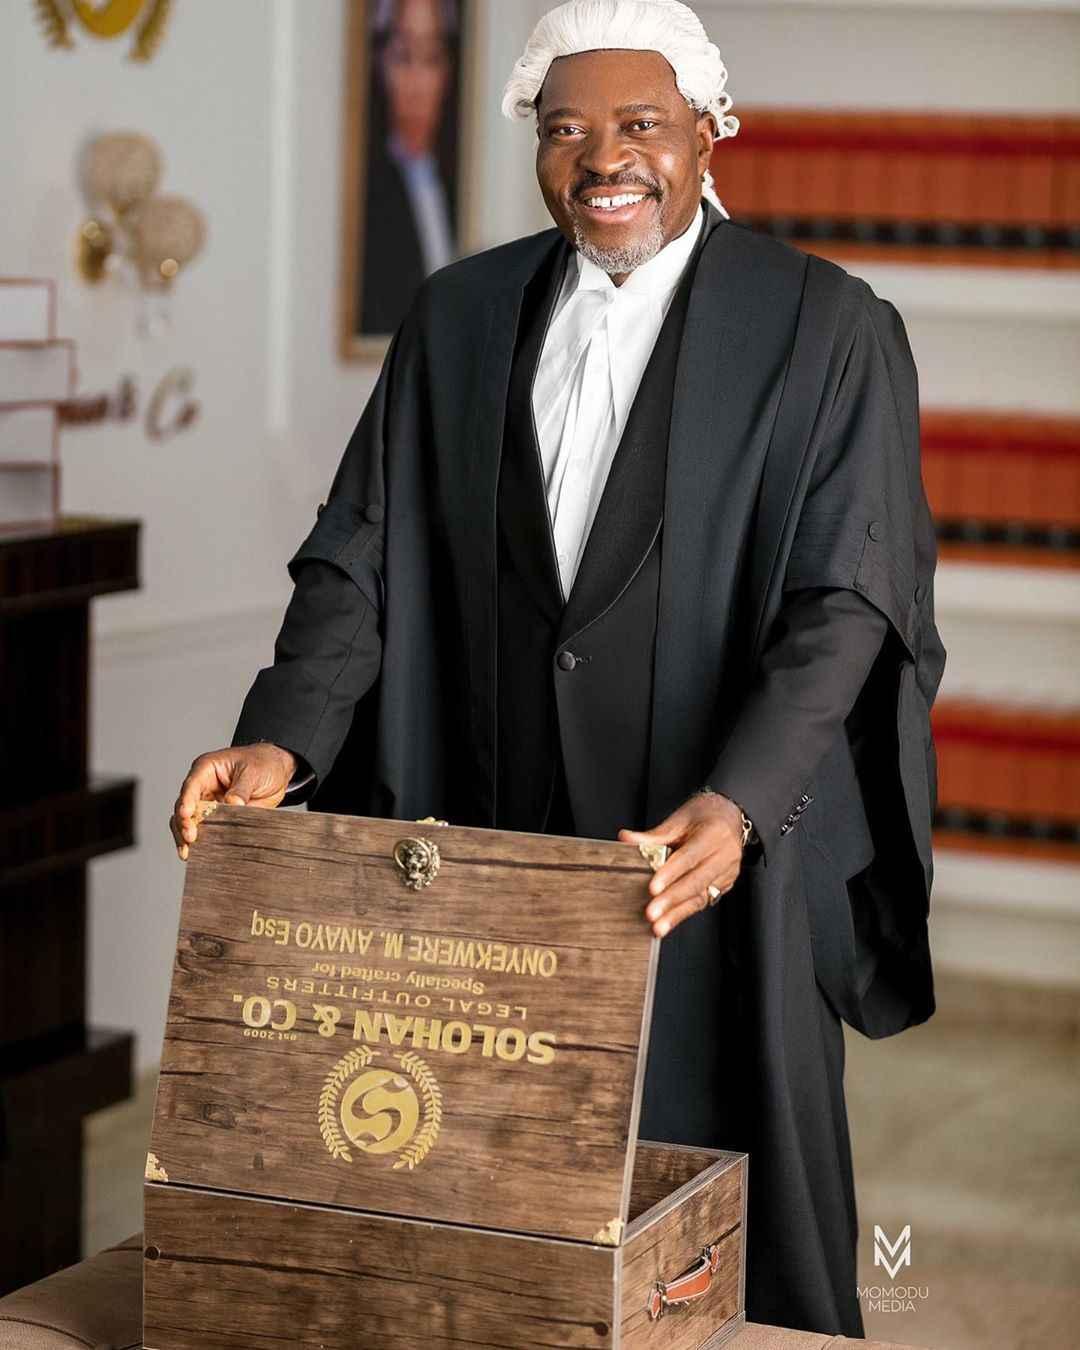 Nigerian Movies: Actor Kanayo O. Kanayo Now a Full Time Lawyer at 58 (Photos) 3